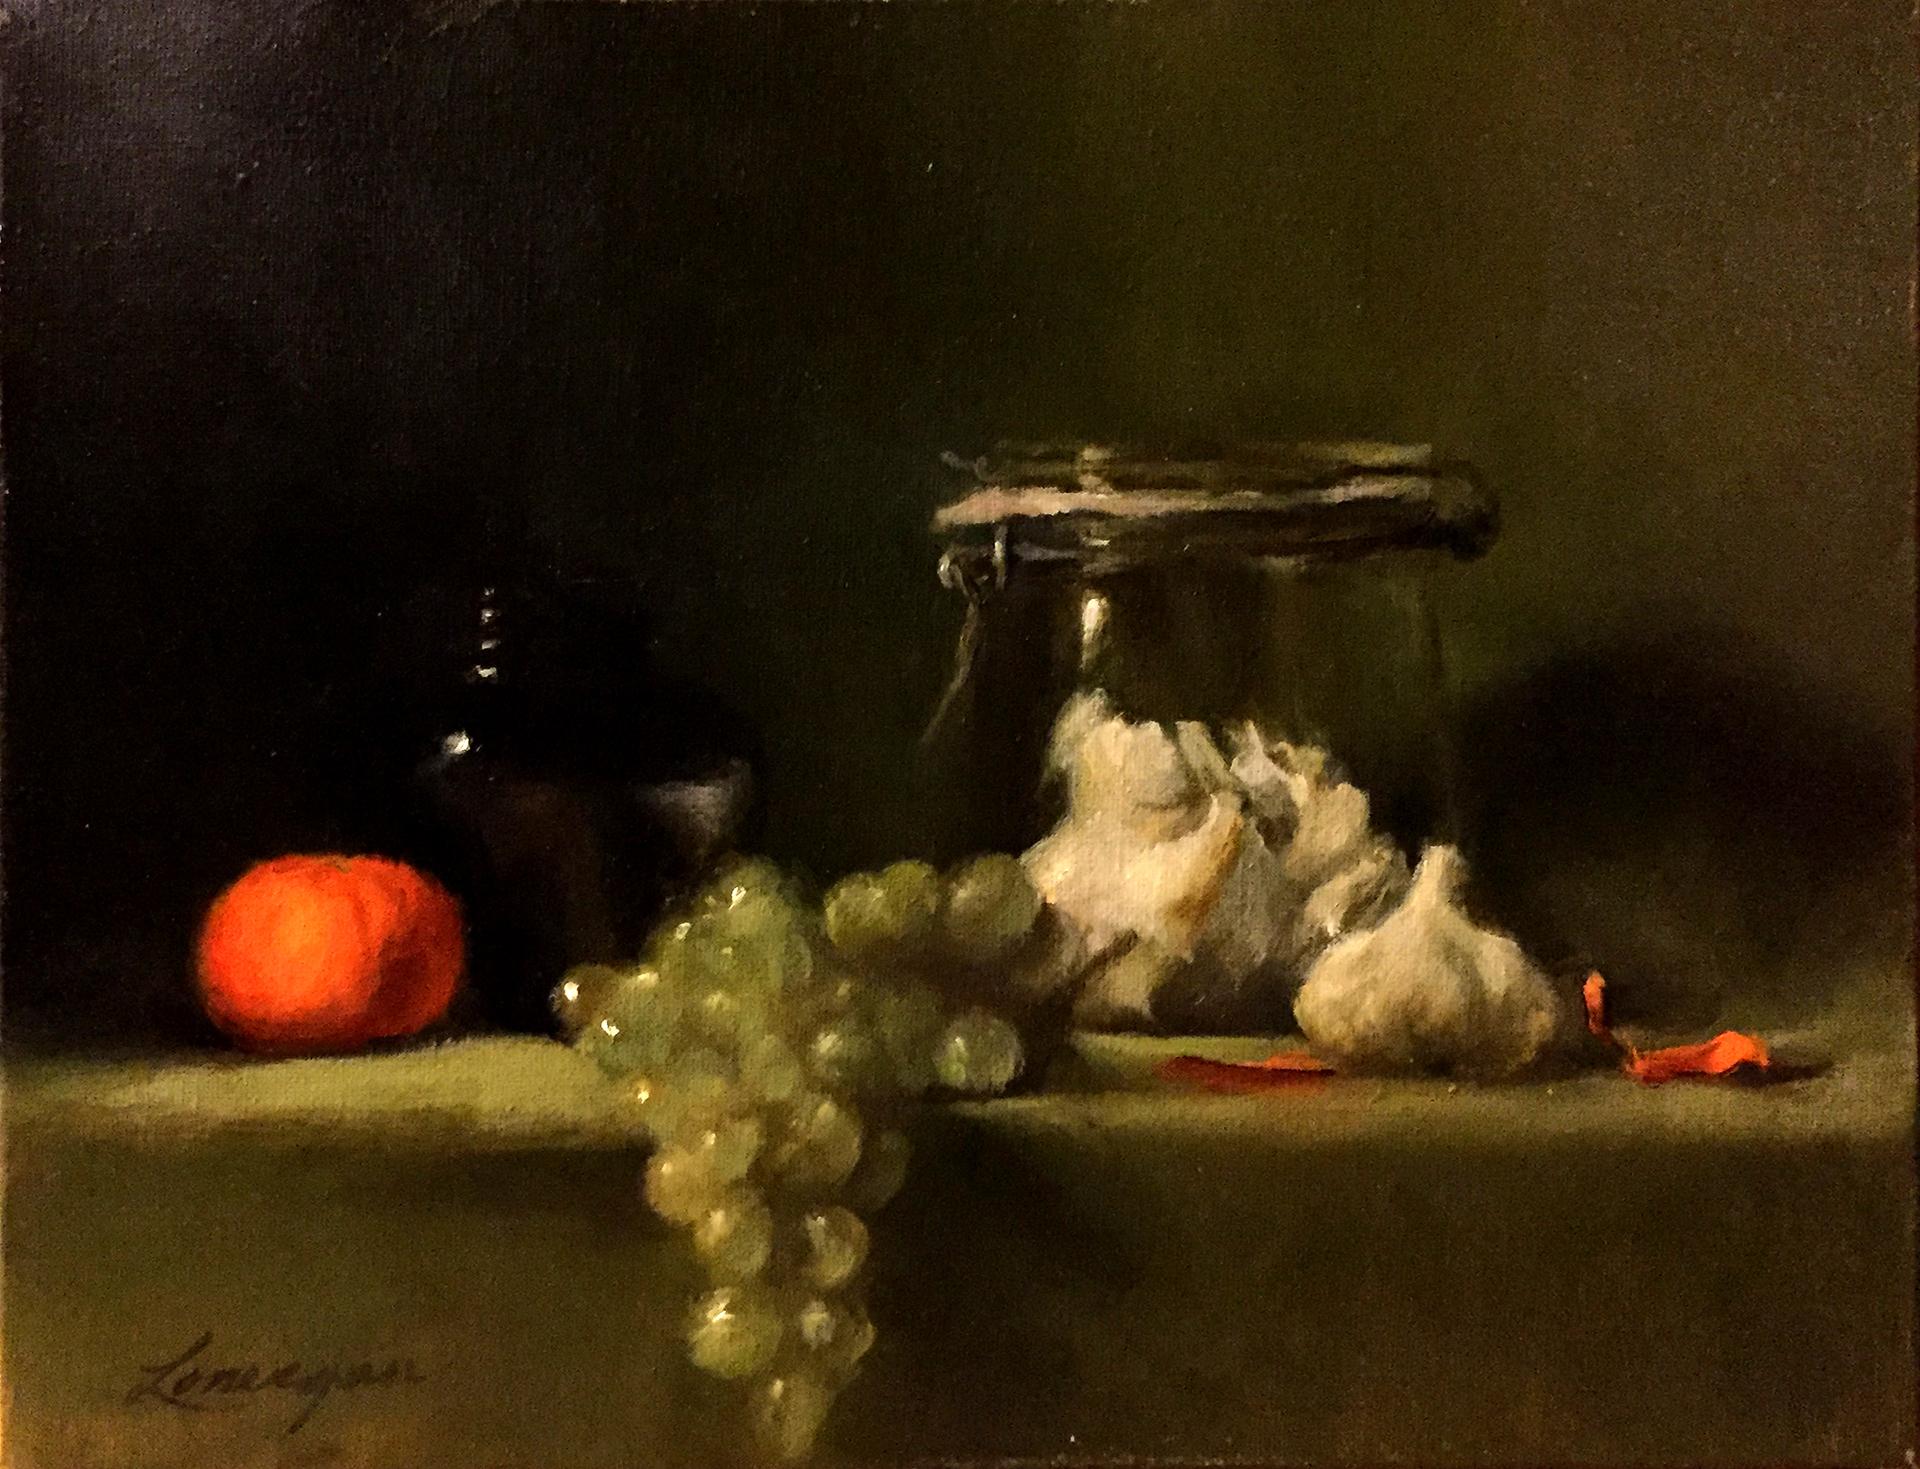 Garlic & Grapes by John Lonergan